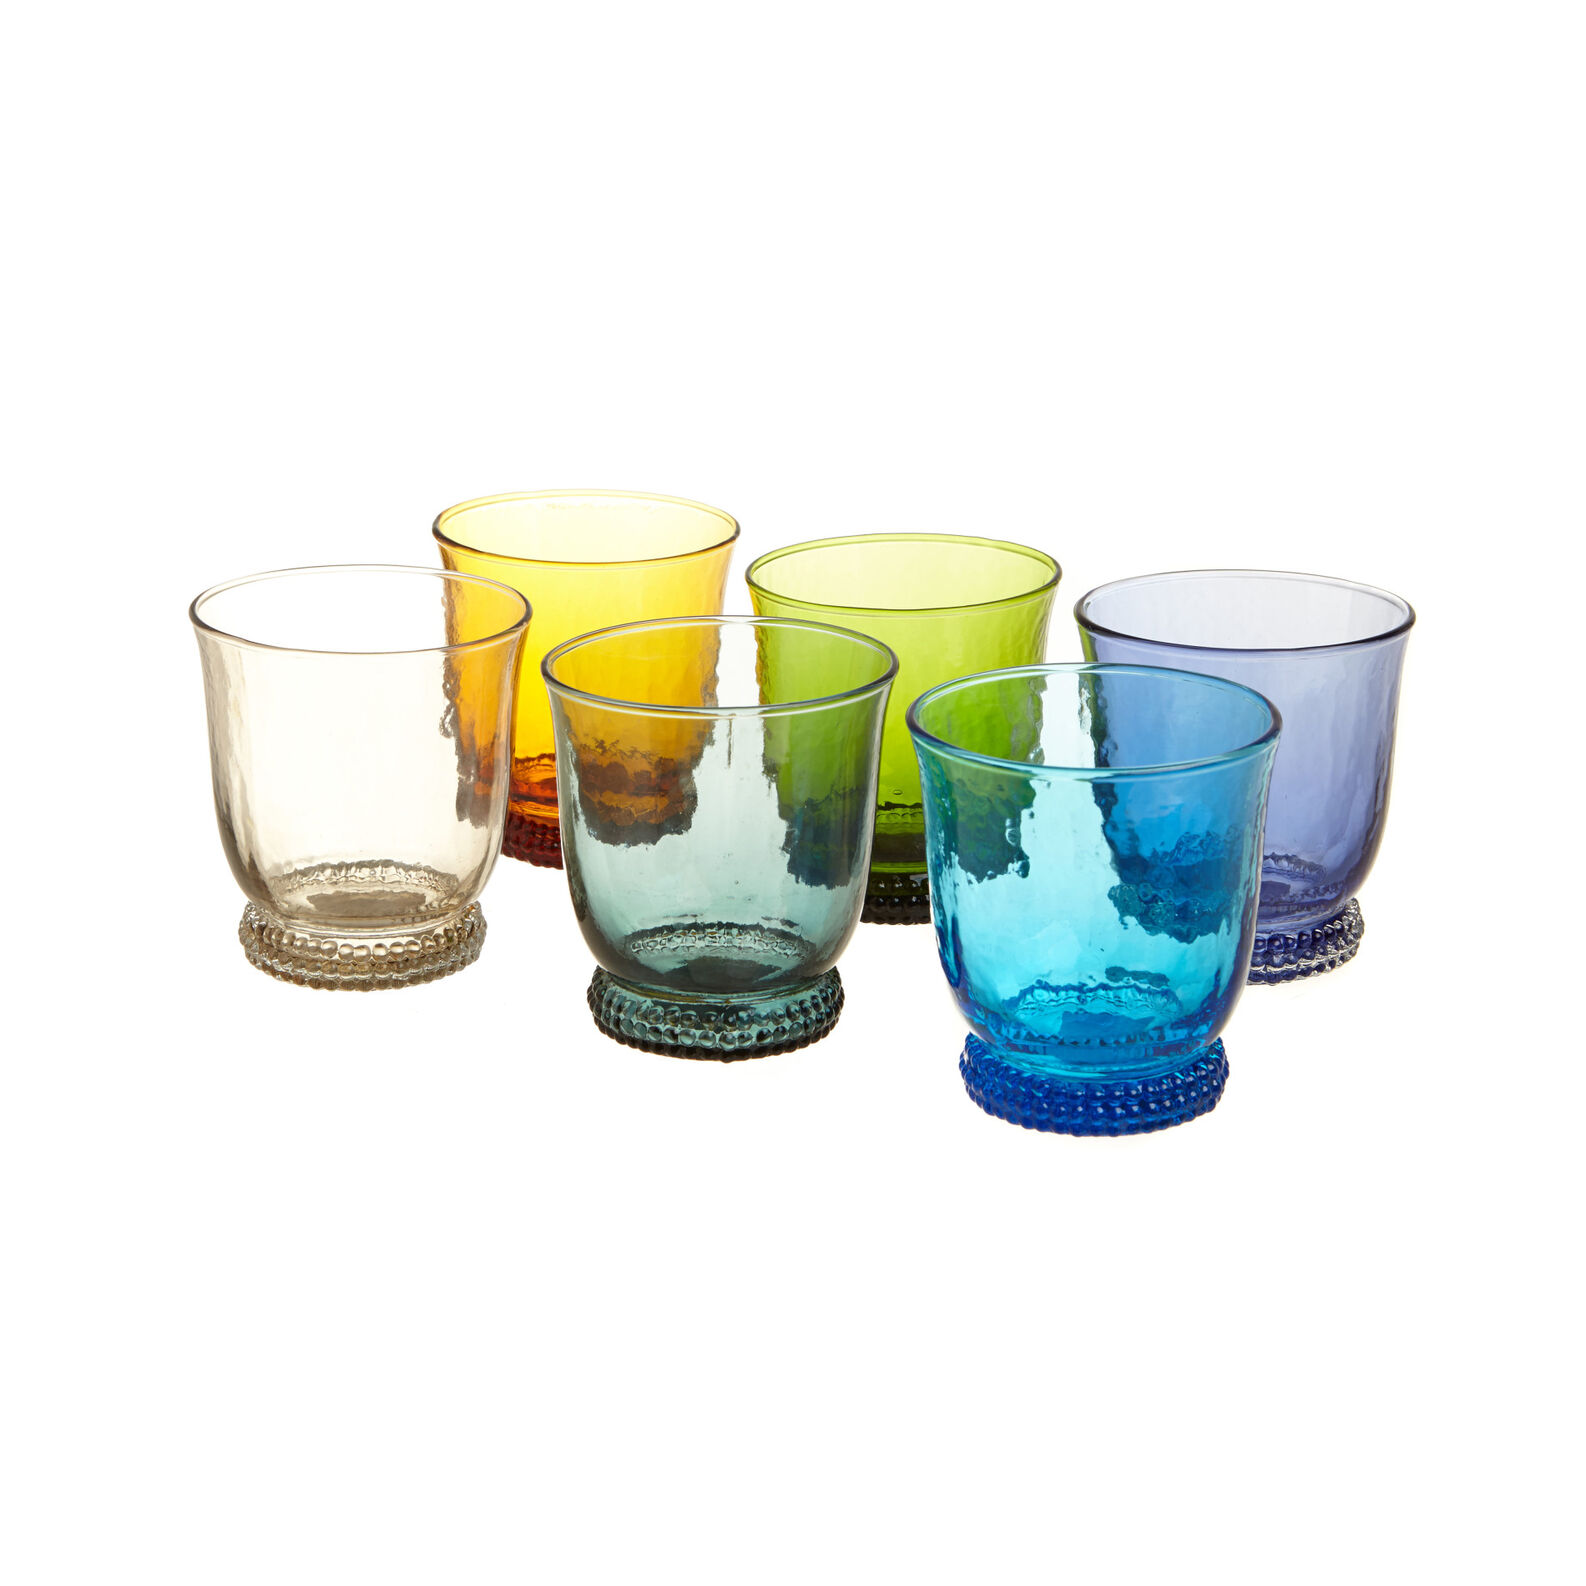 Bicchieri in vetro 28 images bicchiere birra in vetro bicchieri in vetro e cristallo - Coincasa bicchieri ...